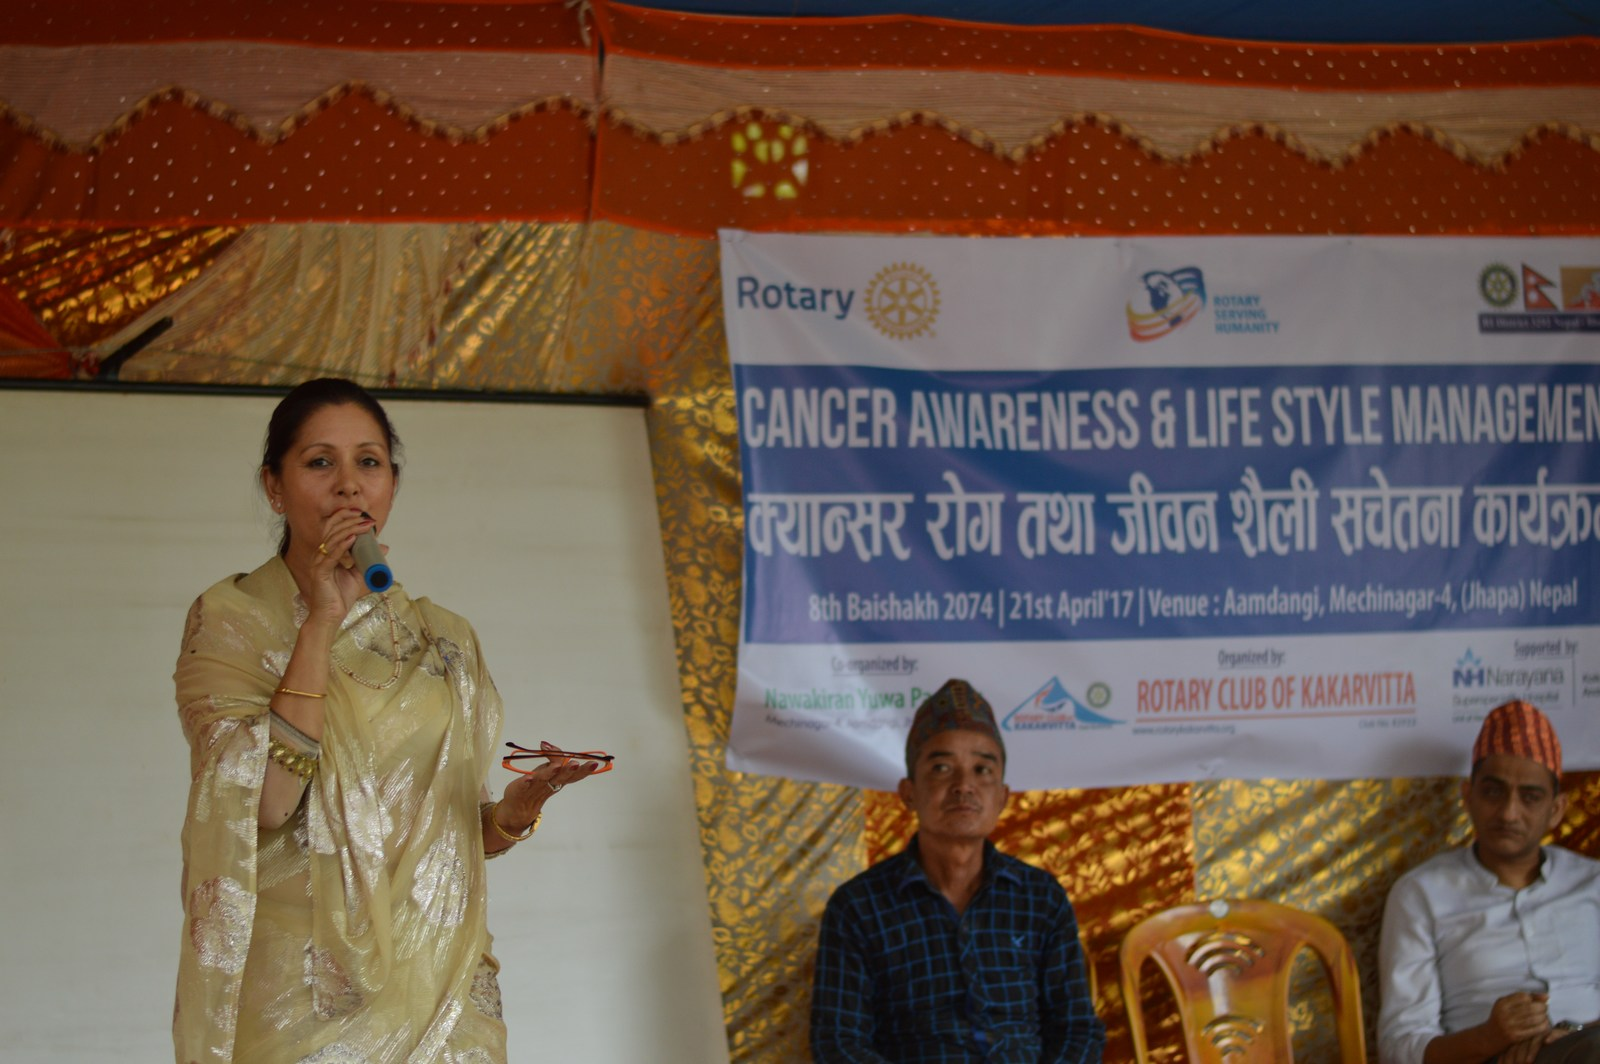 Cancer-Awareness-Life-Style-Management-Interaction-Program-2016-17-Rotary-Club-of-Kakarvitta-33